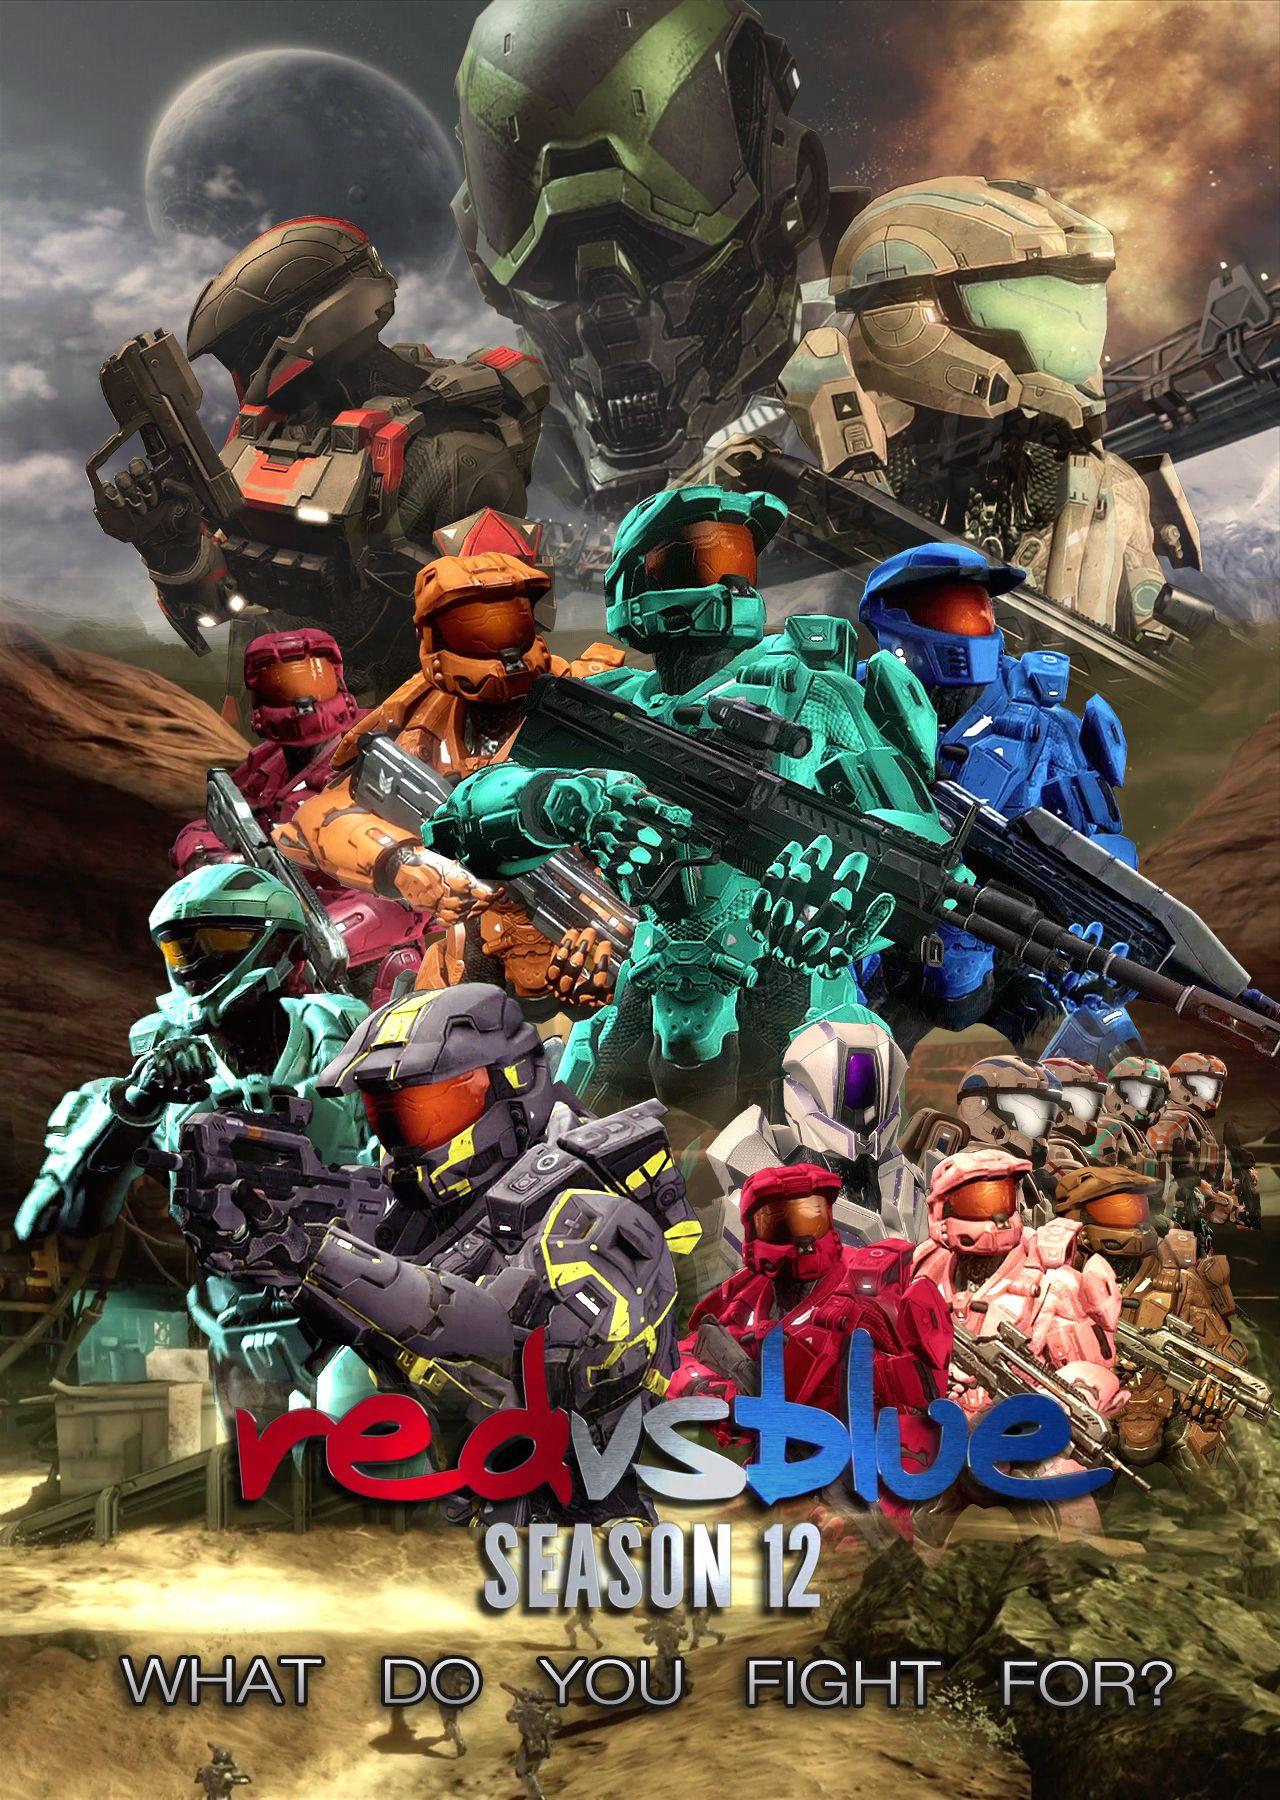 red vs blue)